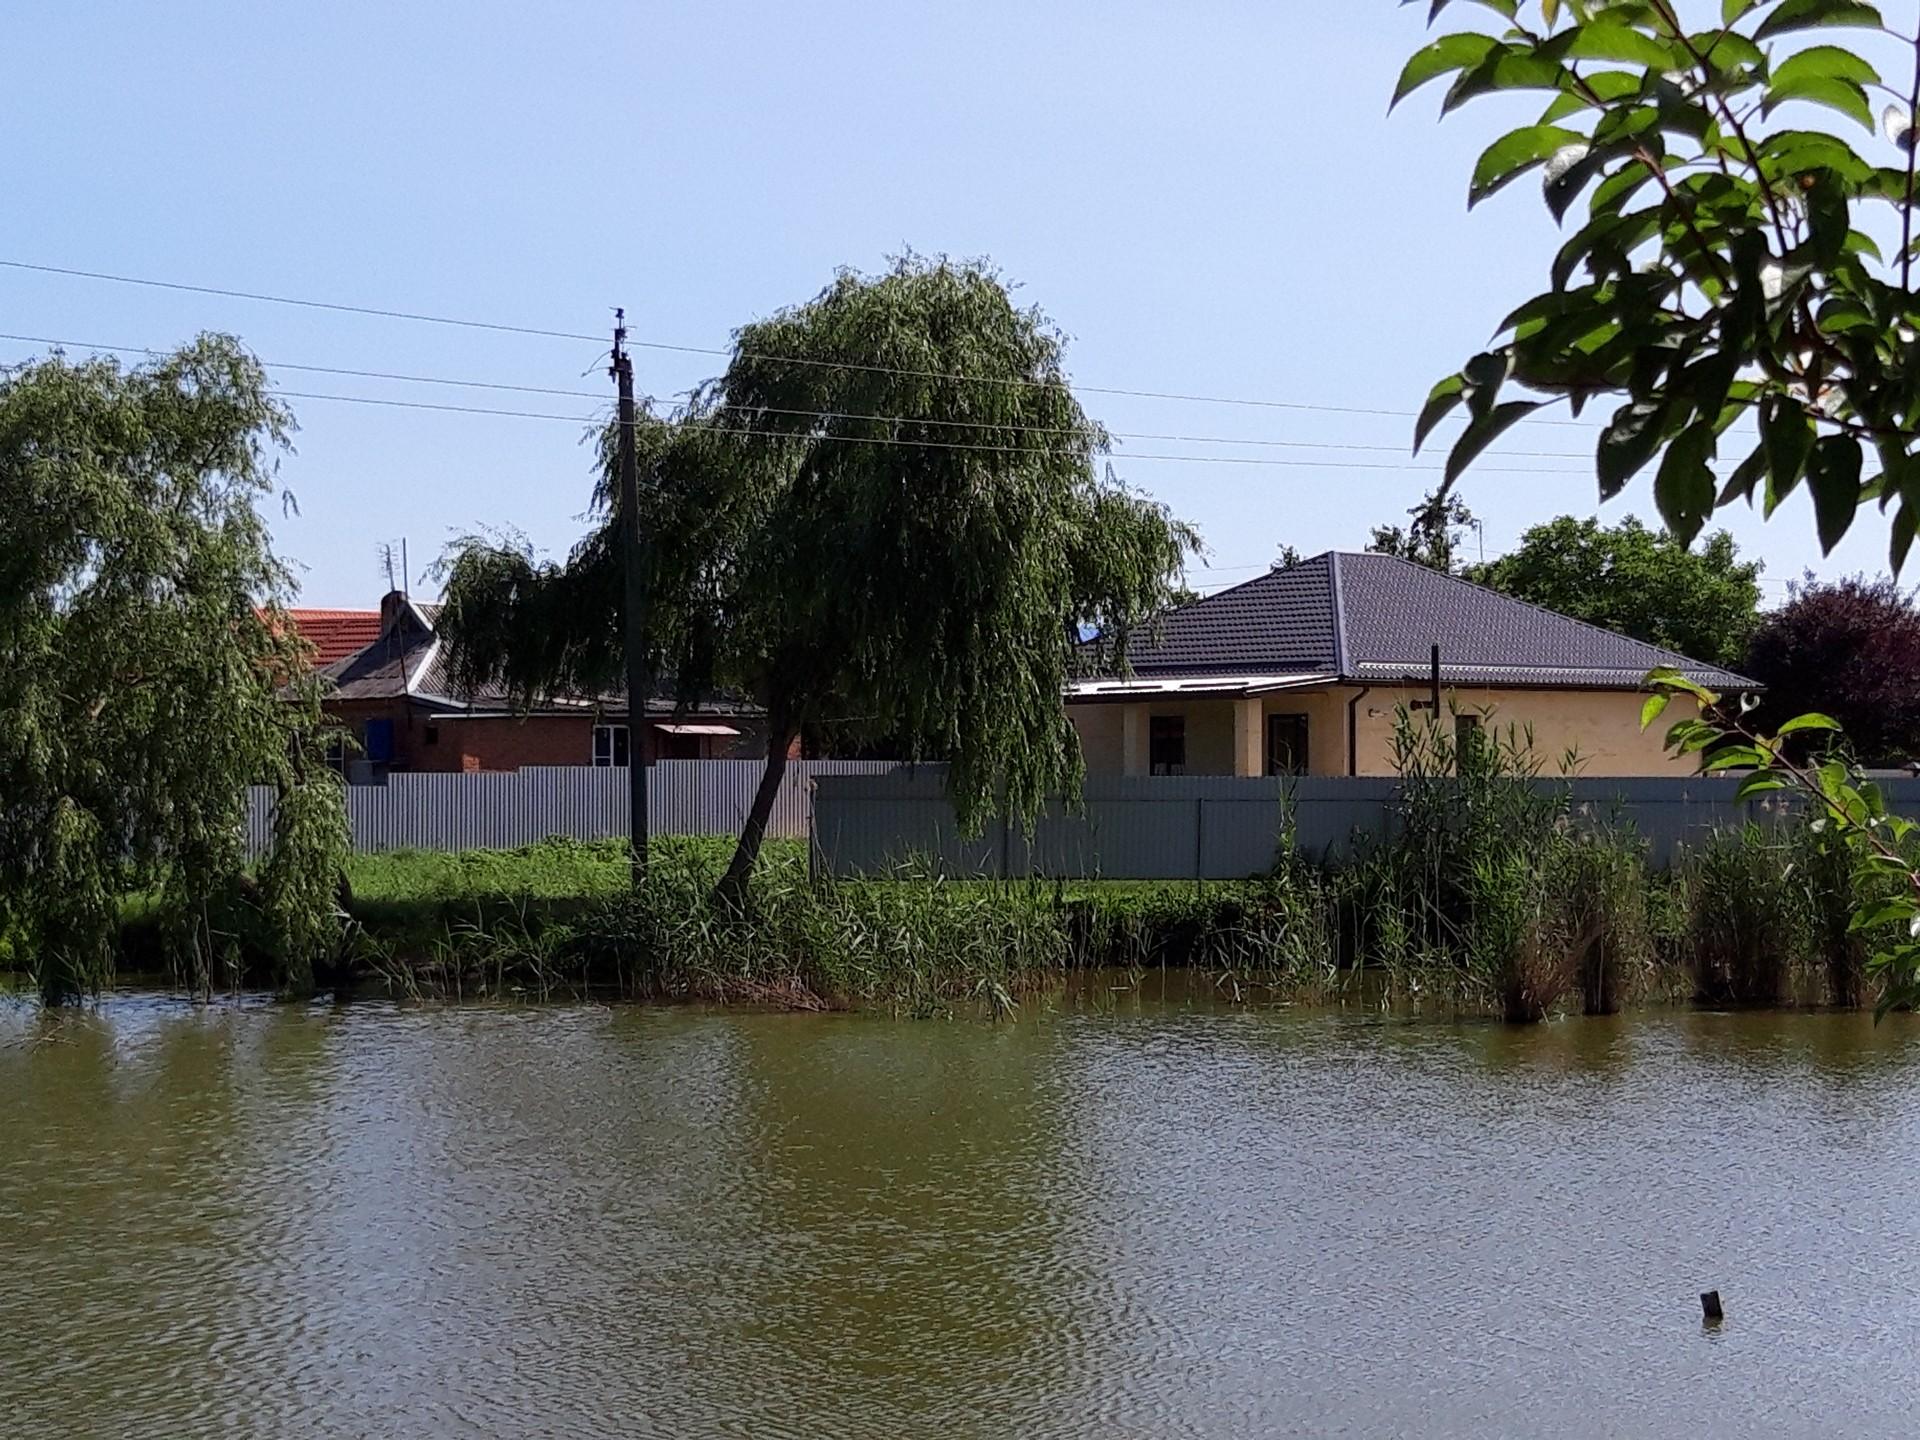 Фото александр станица динская краснодарского края